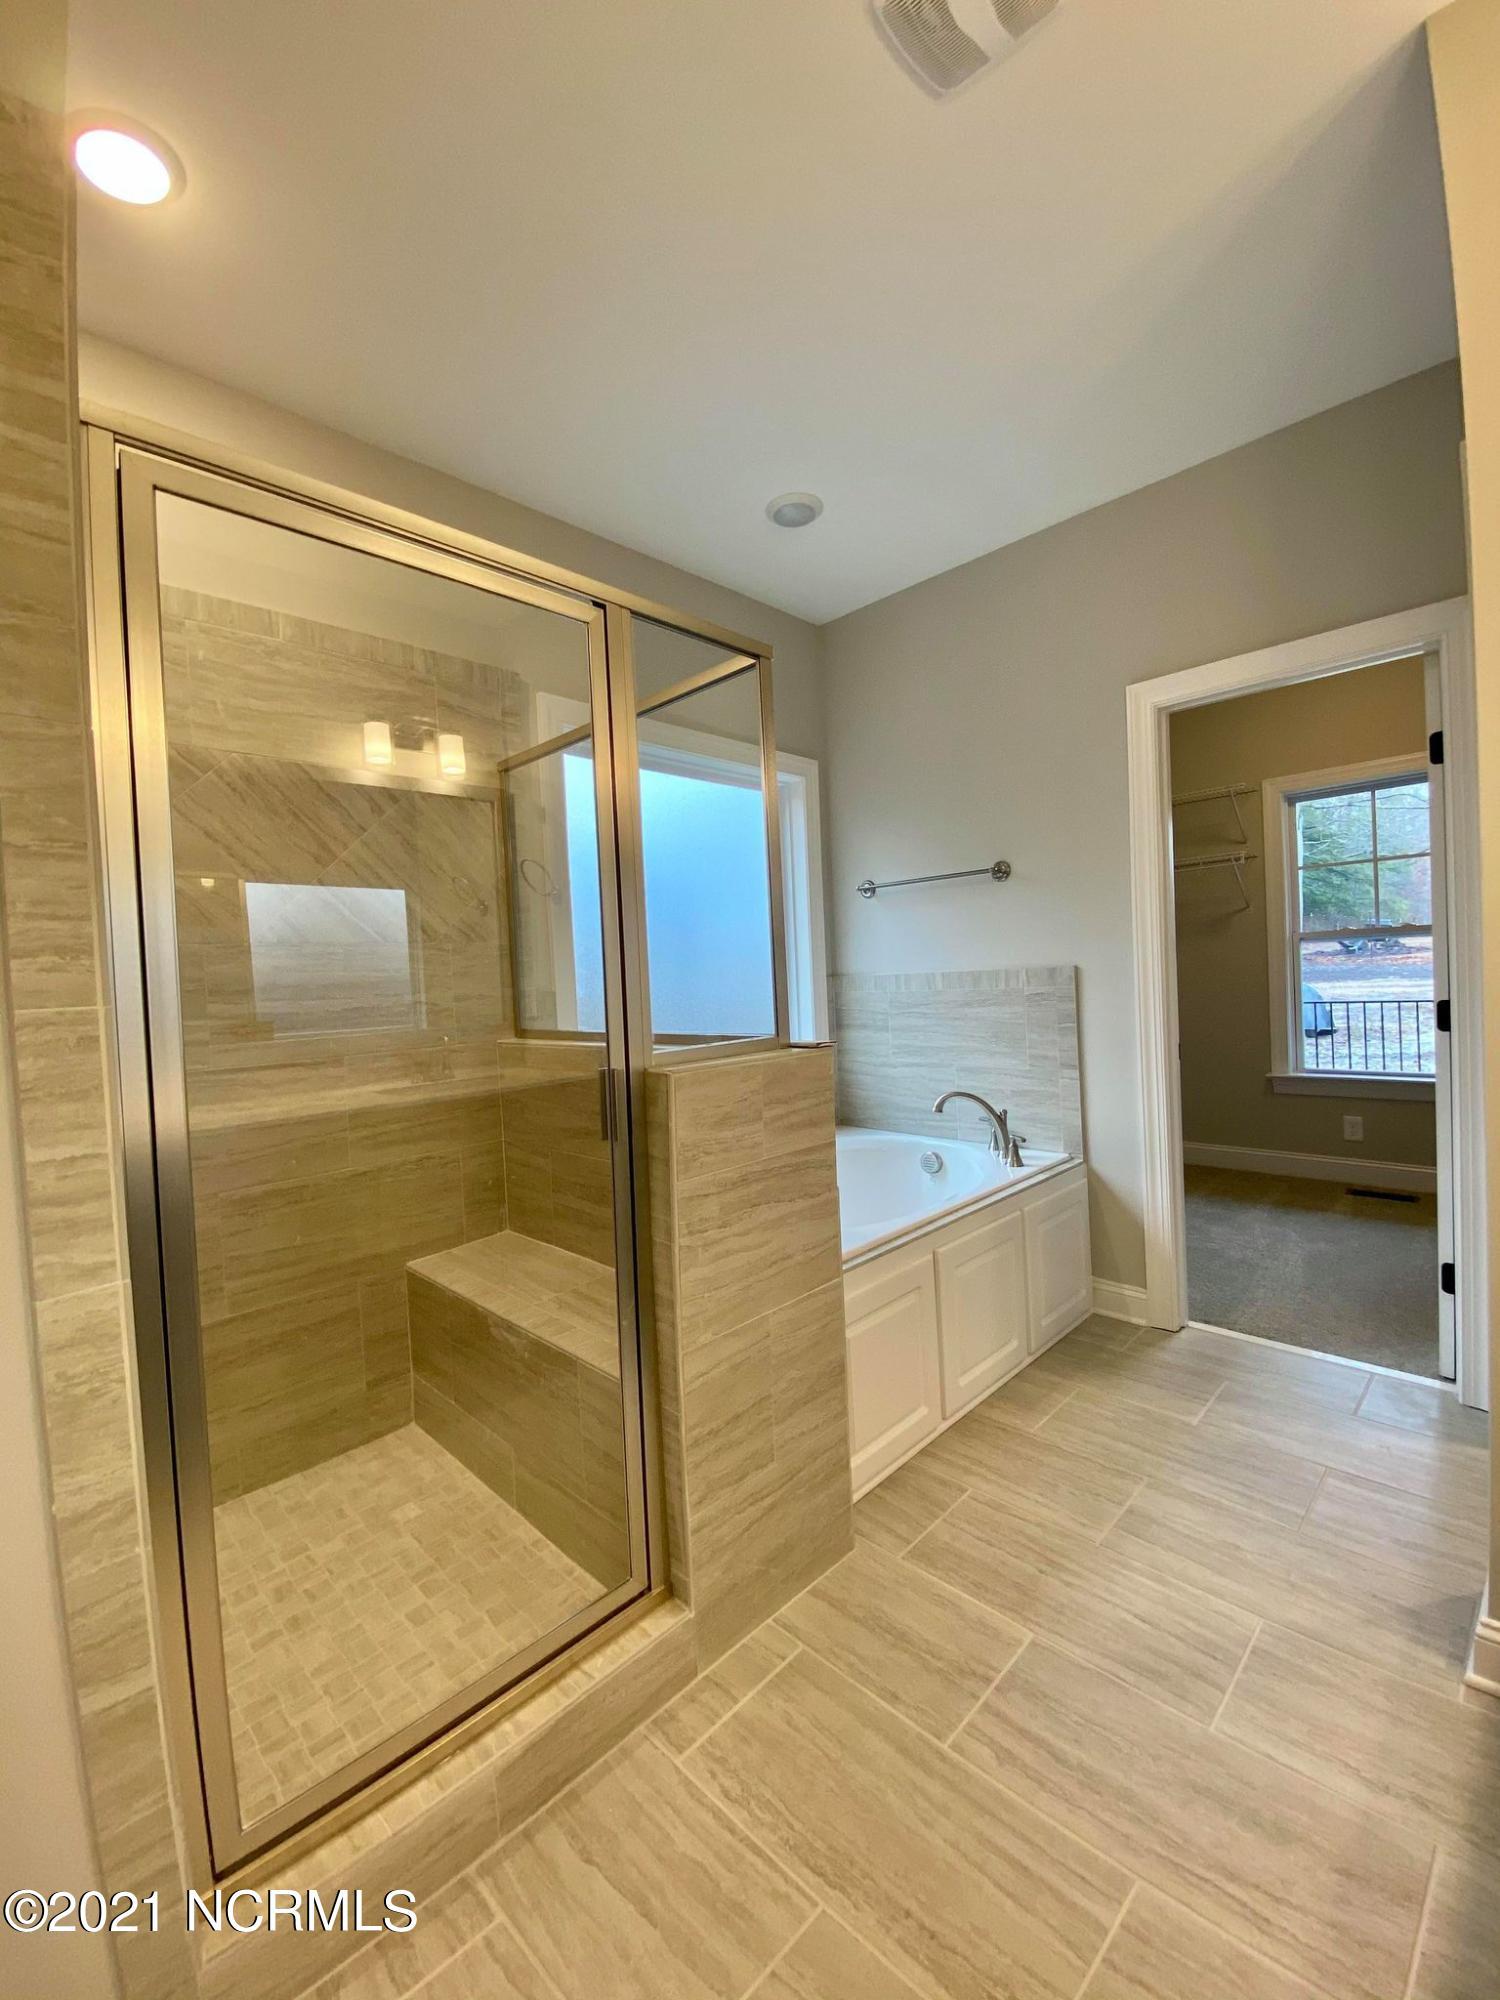 1627 Blue Heron Drive, Nashville, North Carolina 27856, 4 Bedrooms Bedrooms, 10 Rooms Rooms,3 BathroomsBathrooms,Single family residence,For sale,Blue Heron,100228989